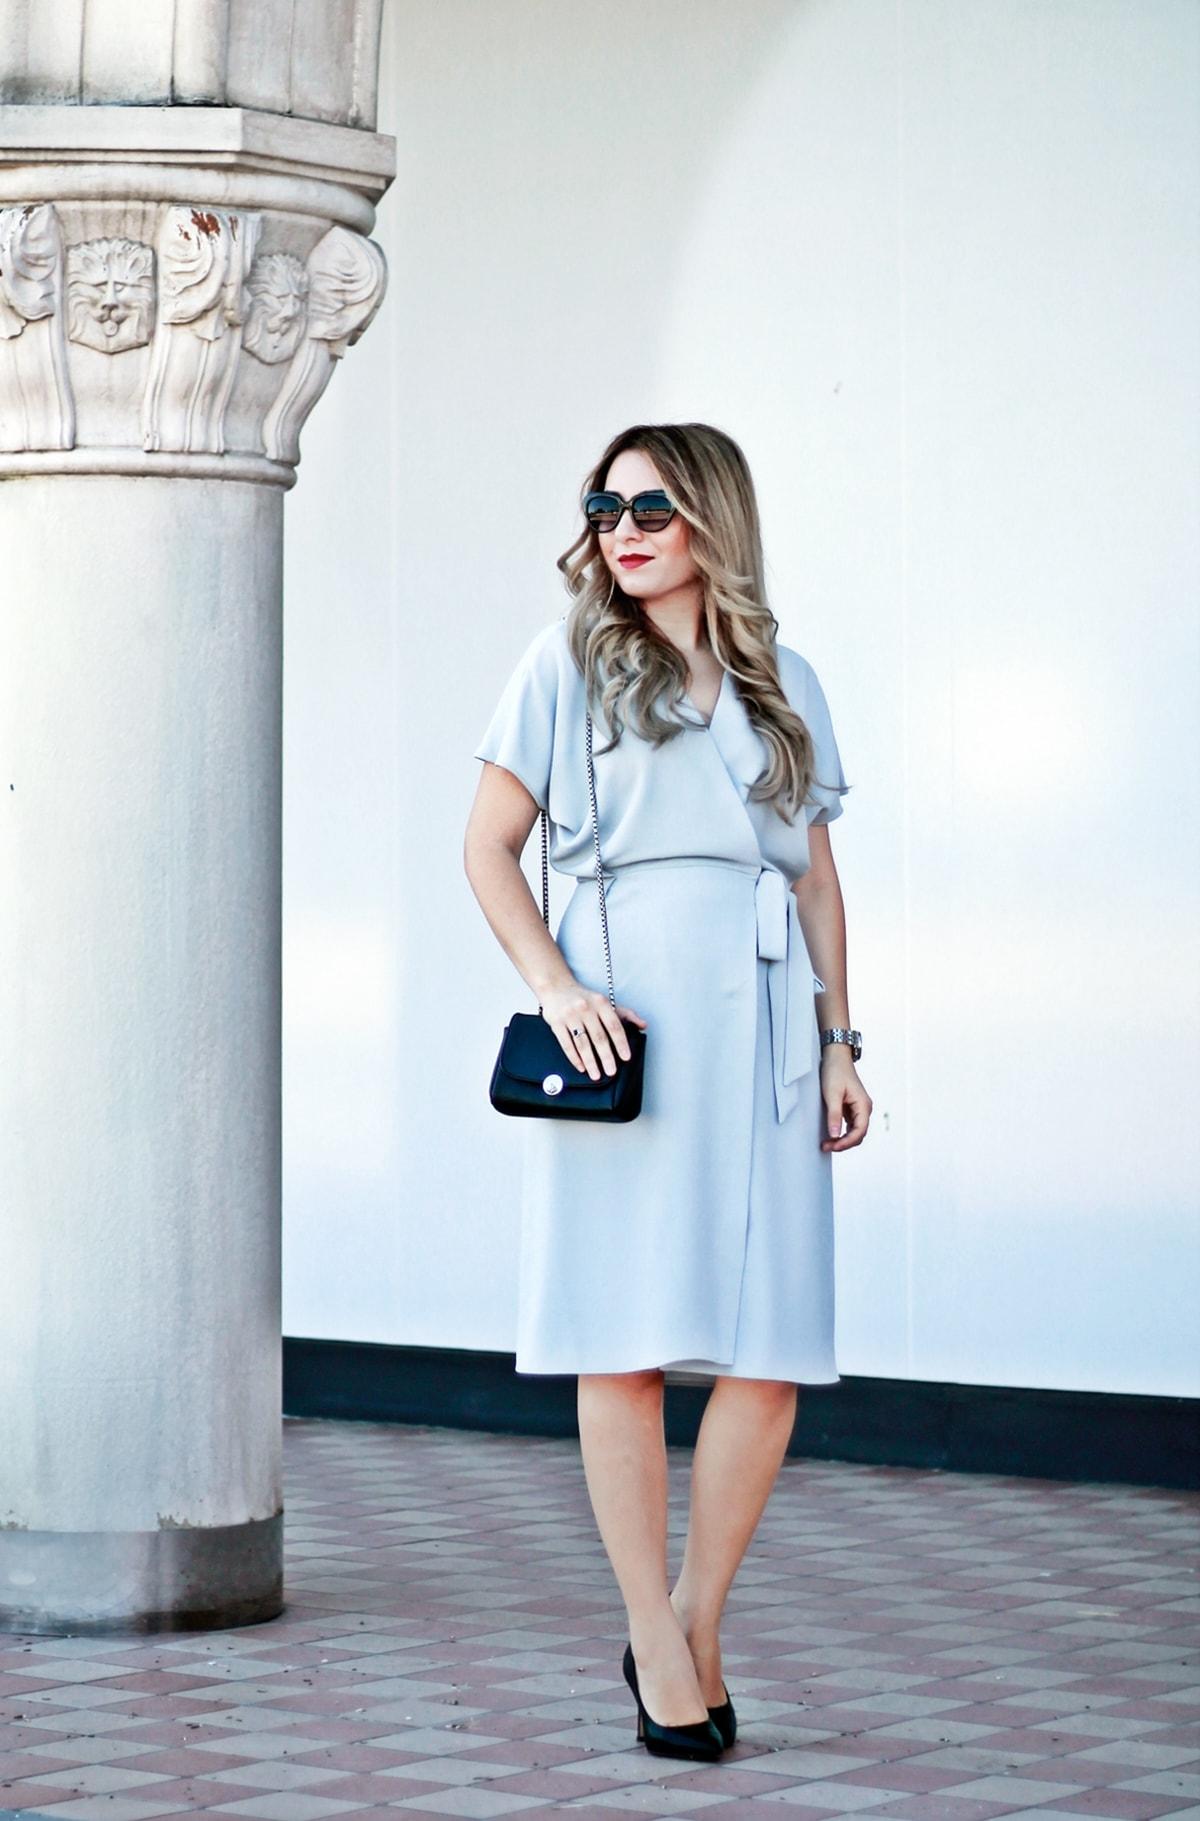 Andreea Ristea, tinuta de vara, ochelari de soare, rochie gri parte peste parte cu cordon in talie, rochie office, rochie eleganta, woman fashion